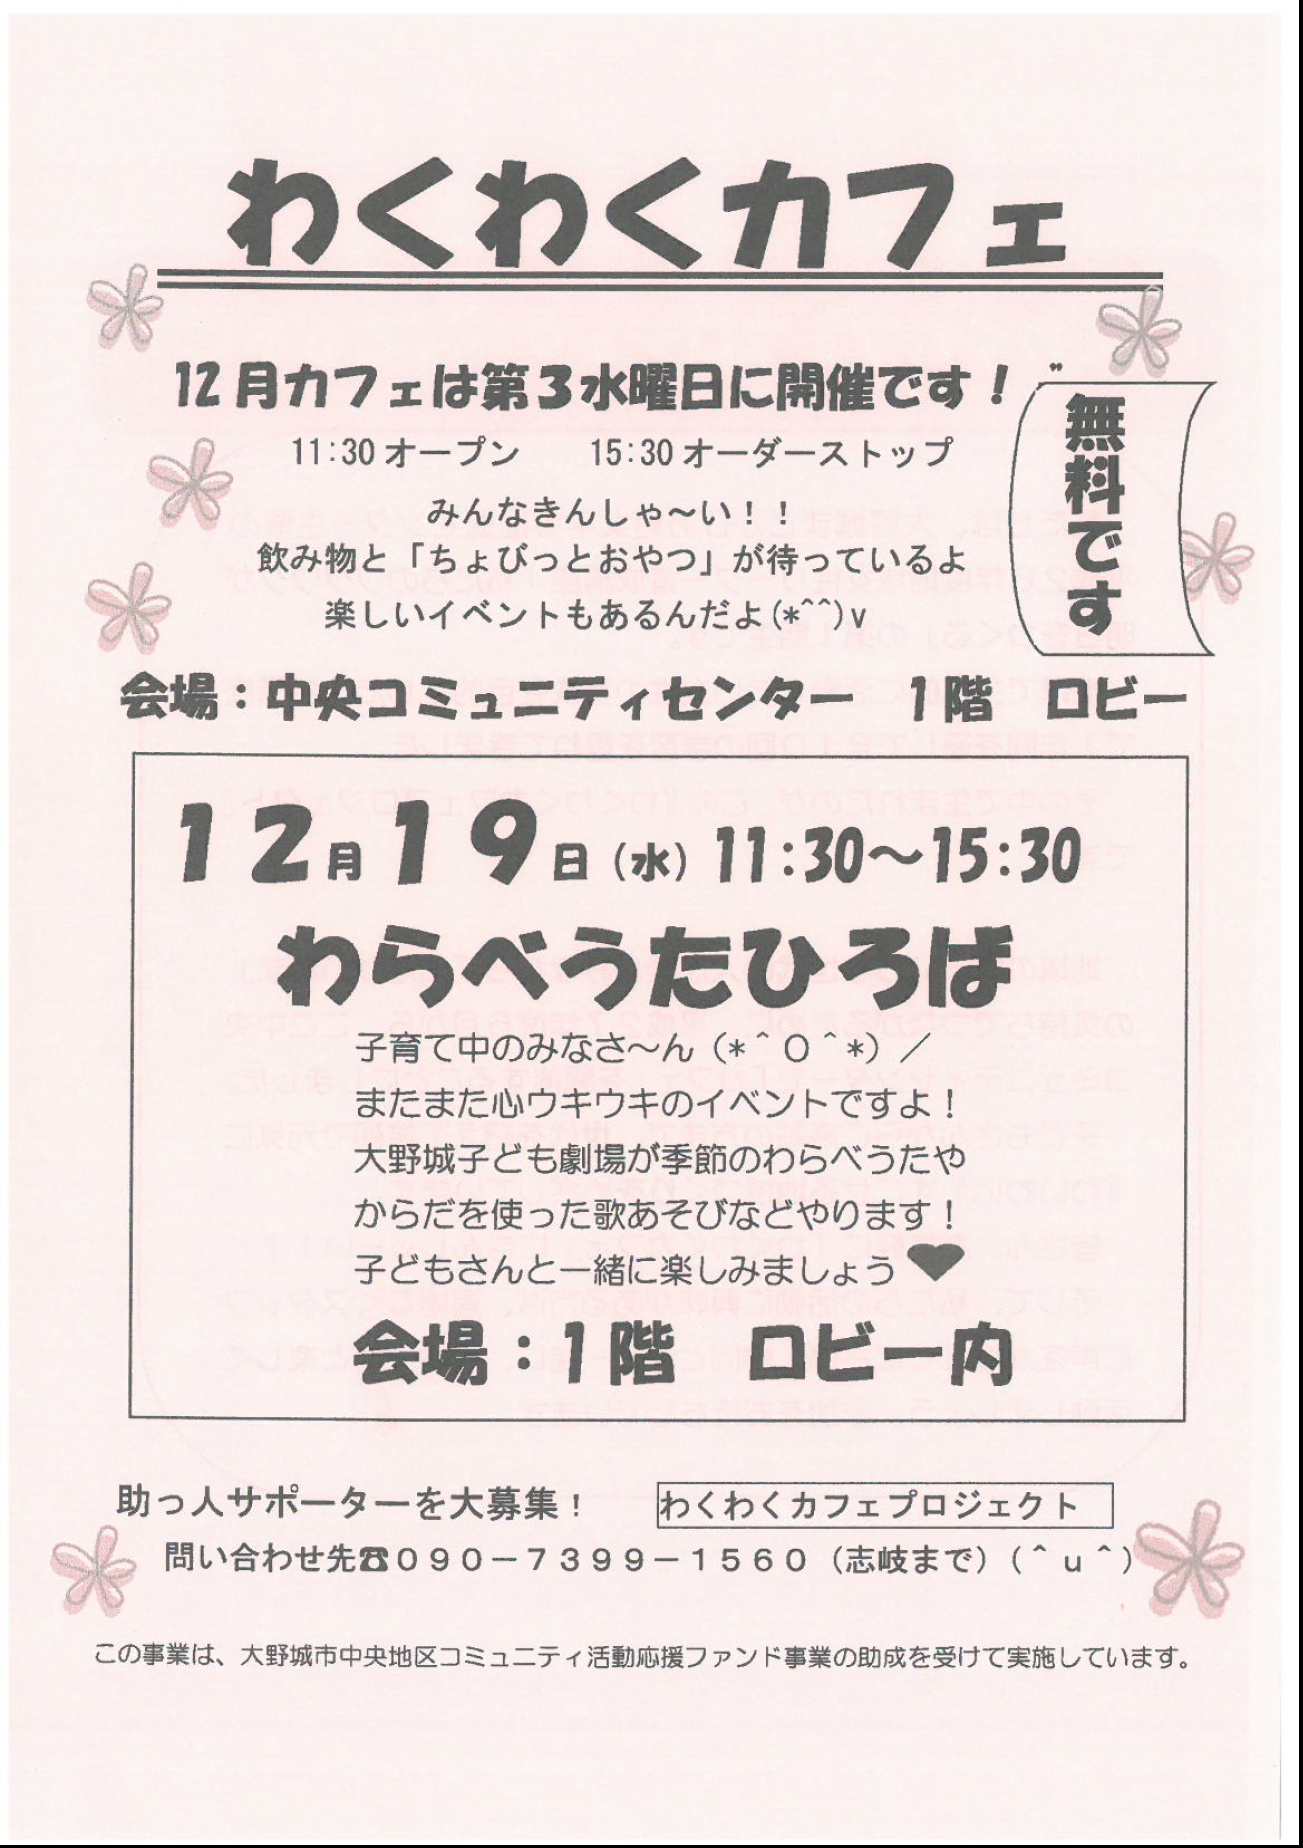 wakuwaku_chirashi201812_omote.png